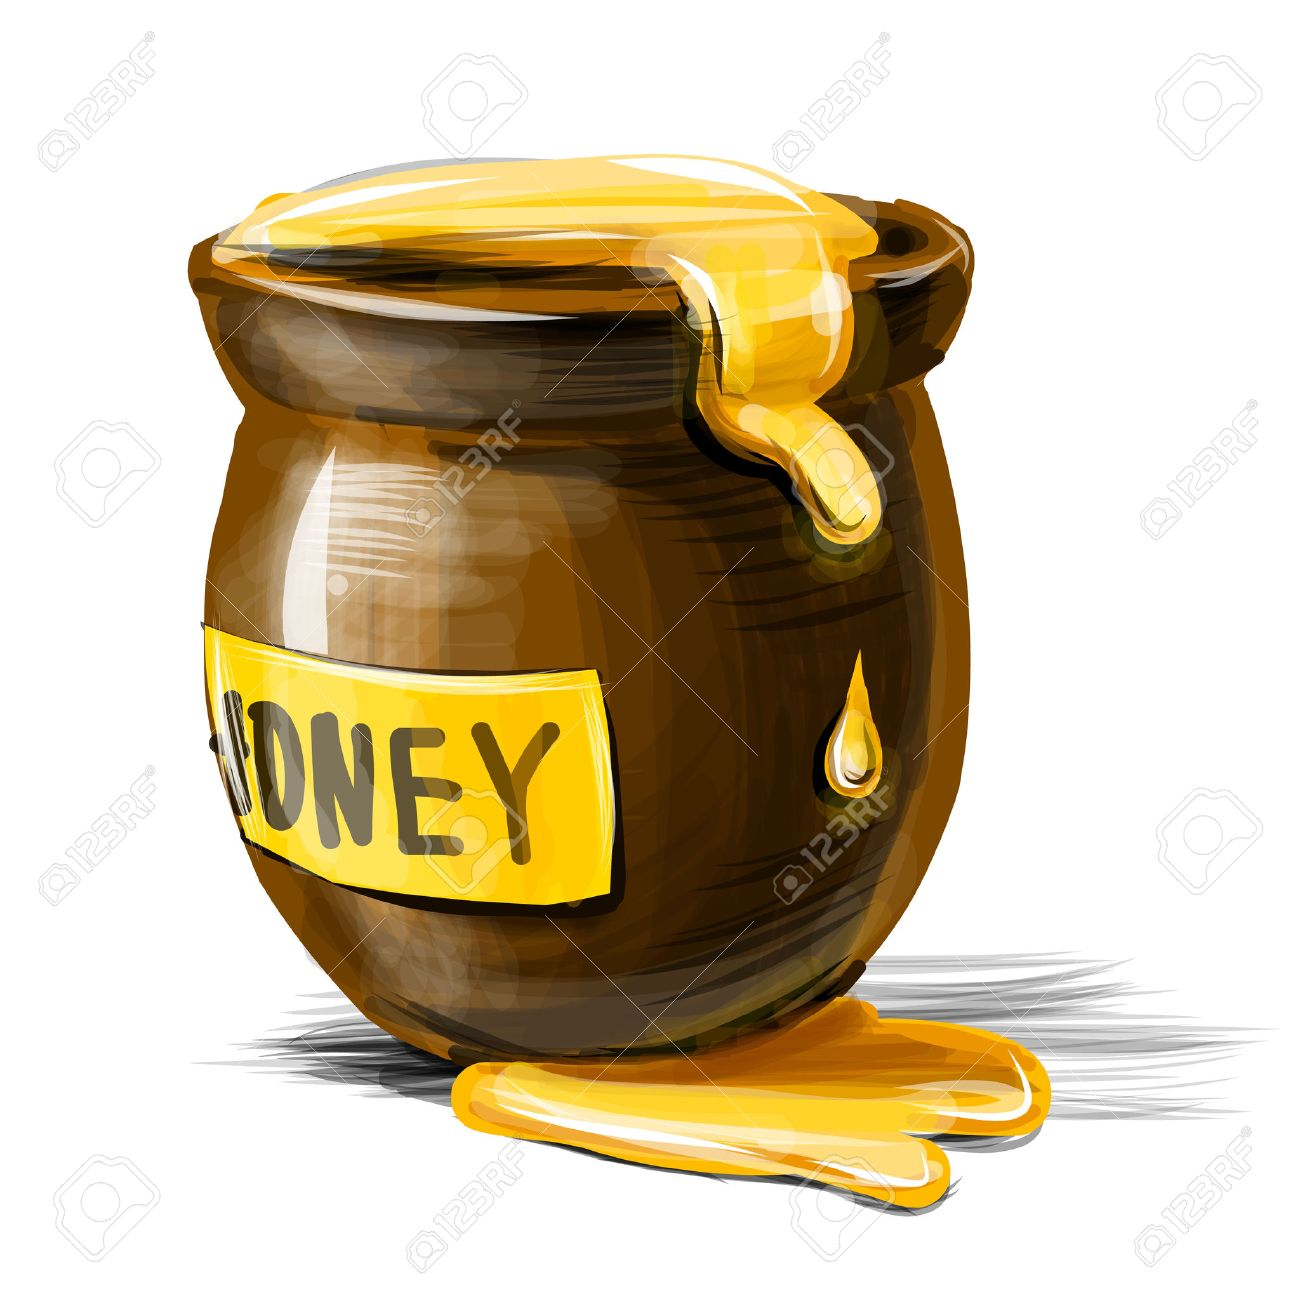 Honey pot isolated on white background. Vector illustration Stock Vector - 22819681